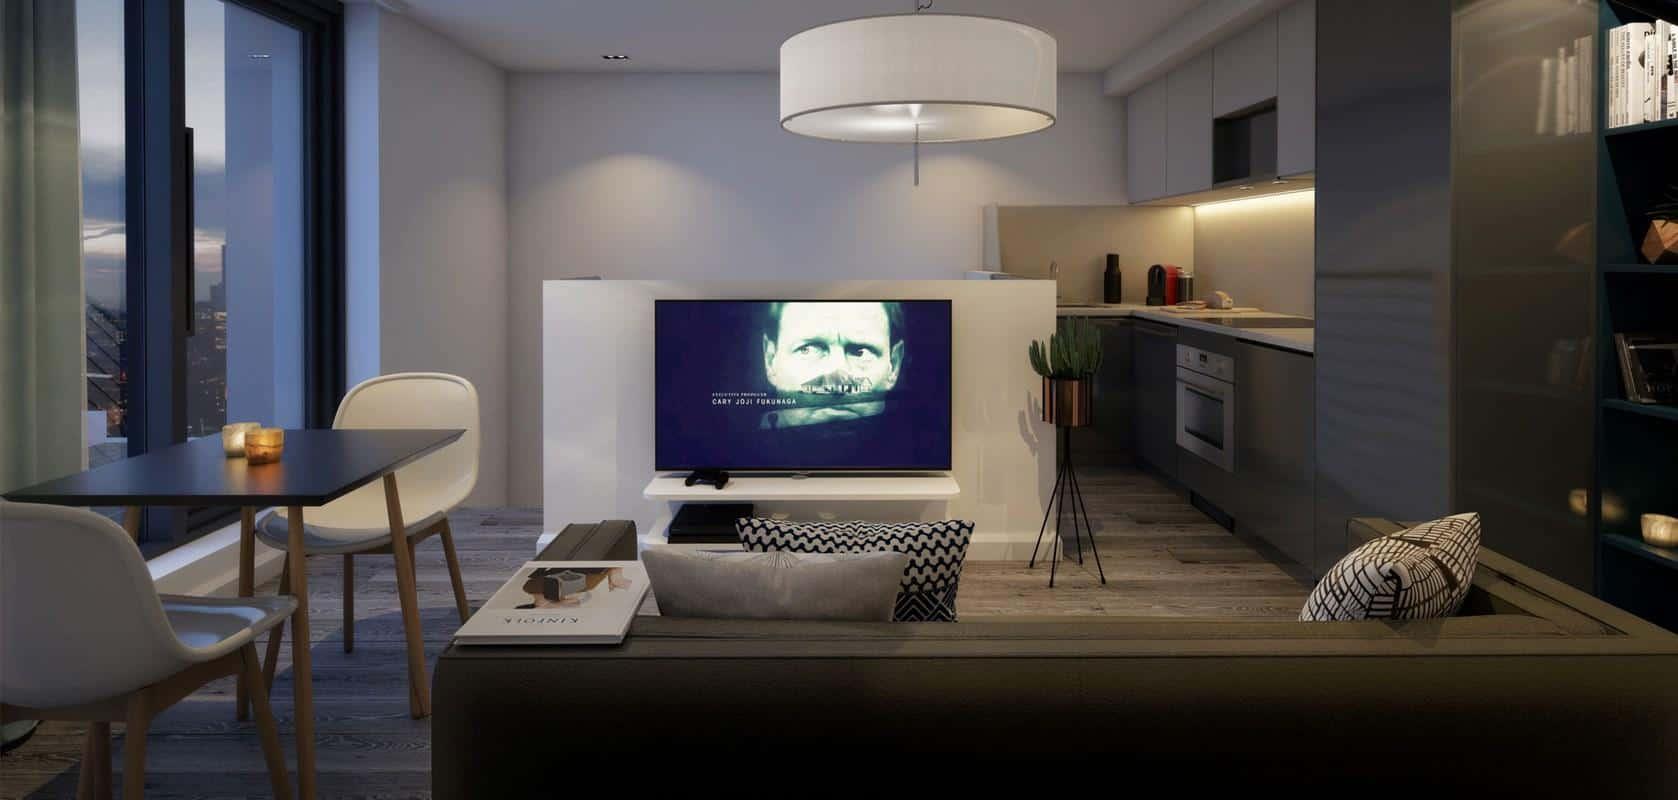 Vita-Student-Circle-Square-Manchester-Cinema-Room-Unilodgers